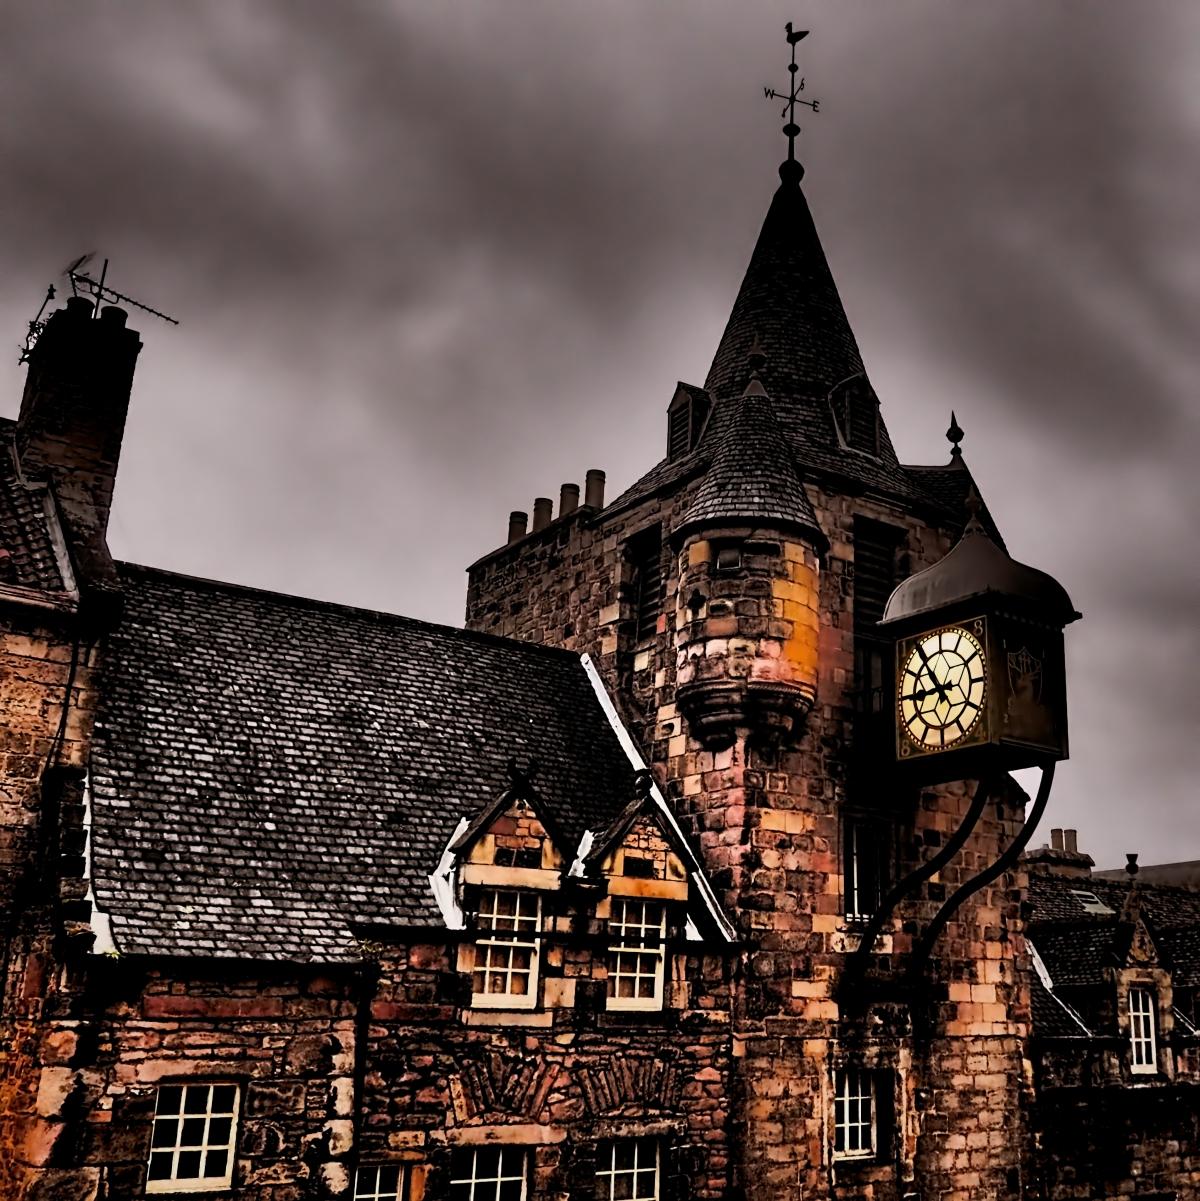 Edinburgh's Tolbooth Tavern Clock Tower at night